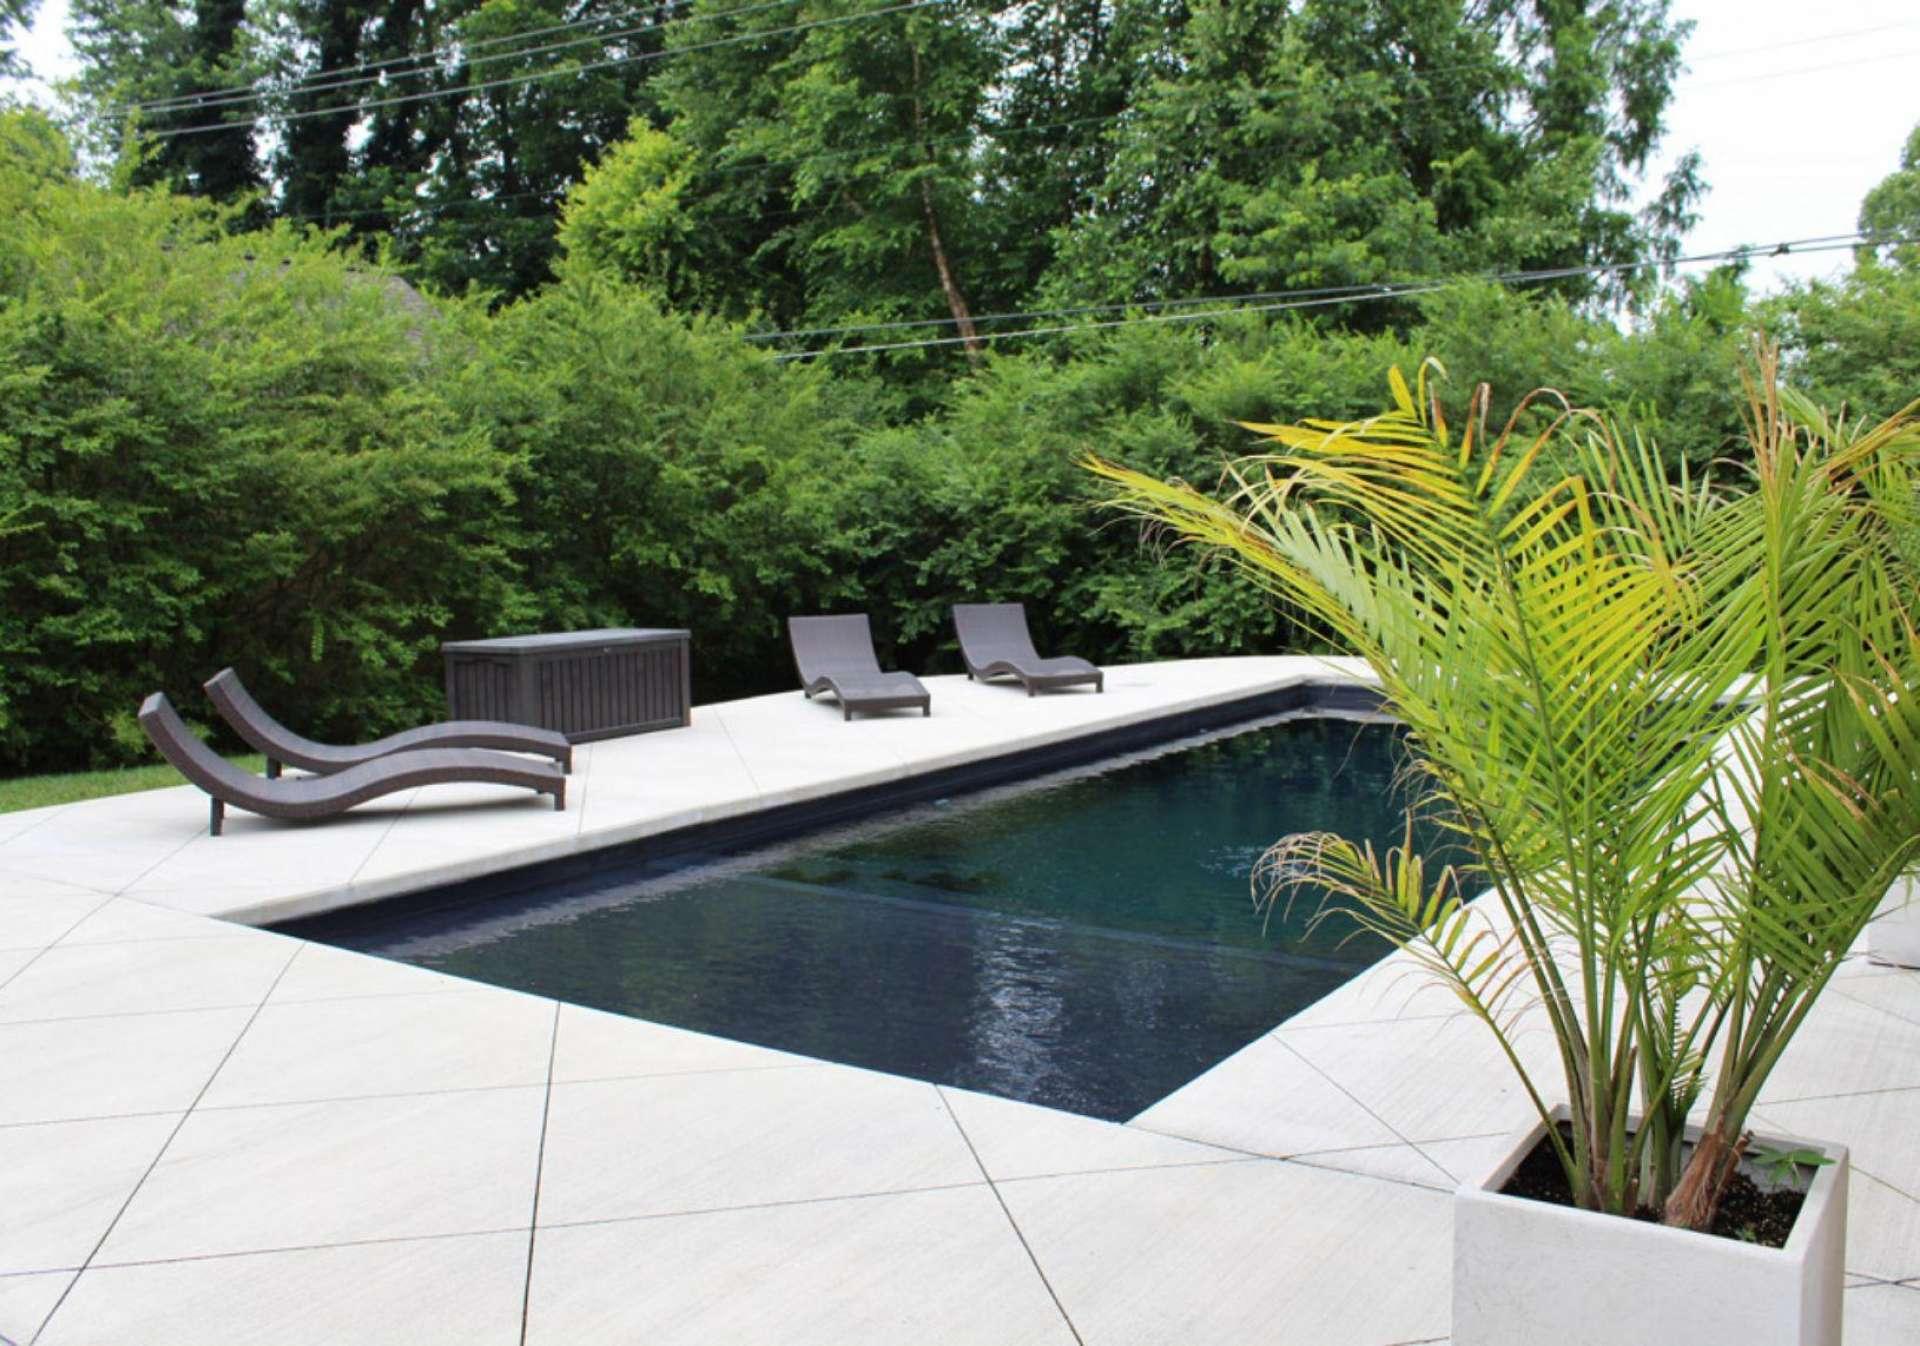 Luxury Fiberglass Swimming Pools | Imagine Pools